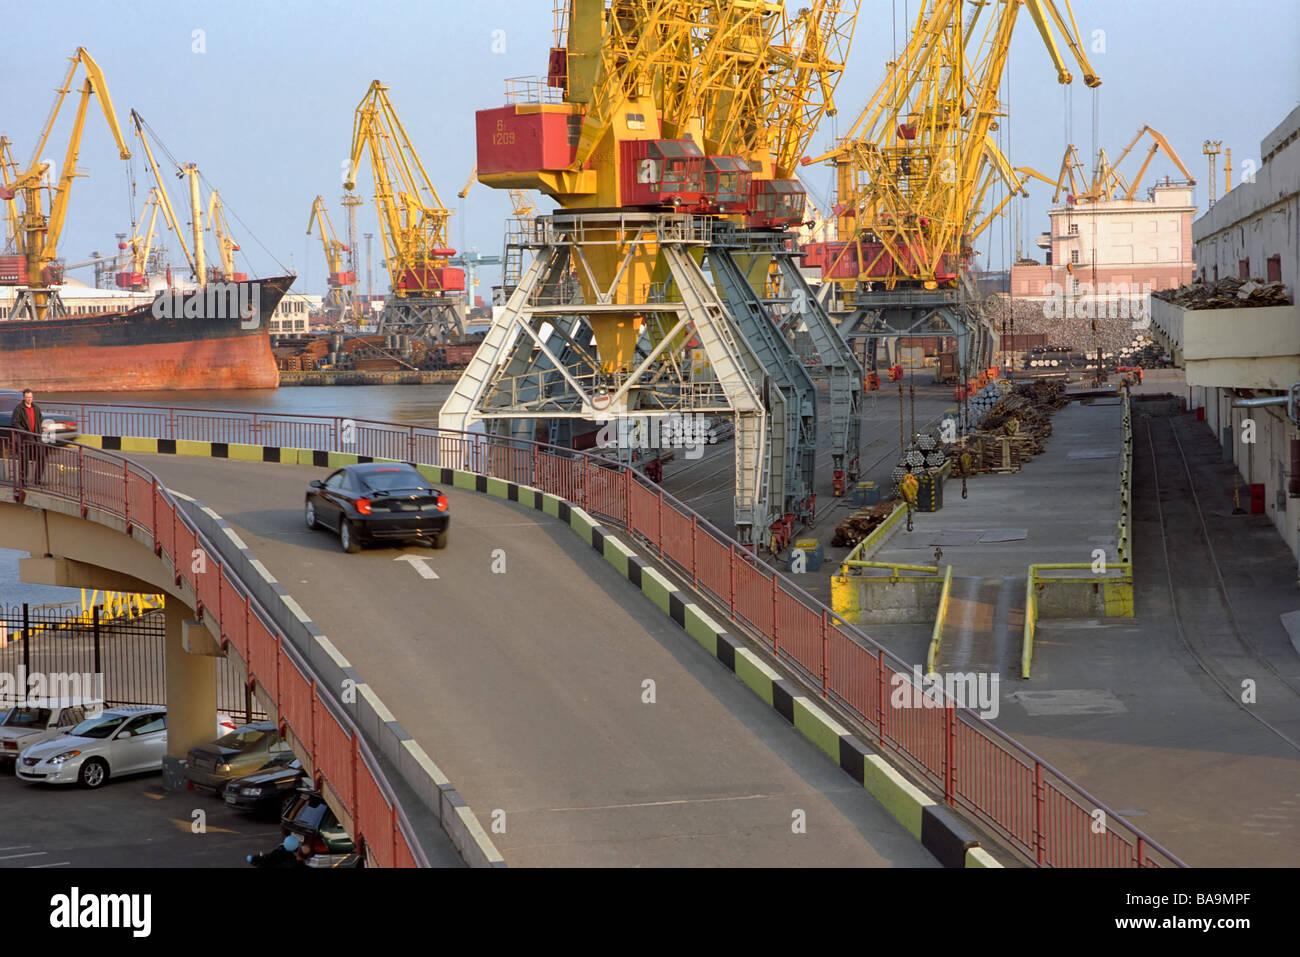 Seaport - Stock Image